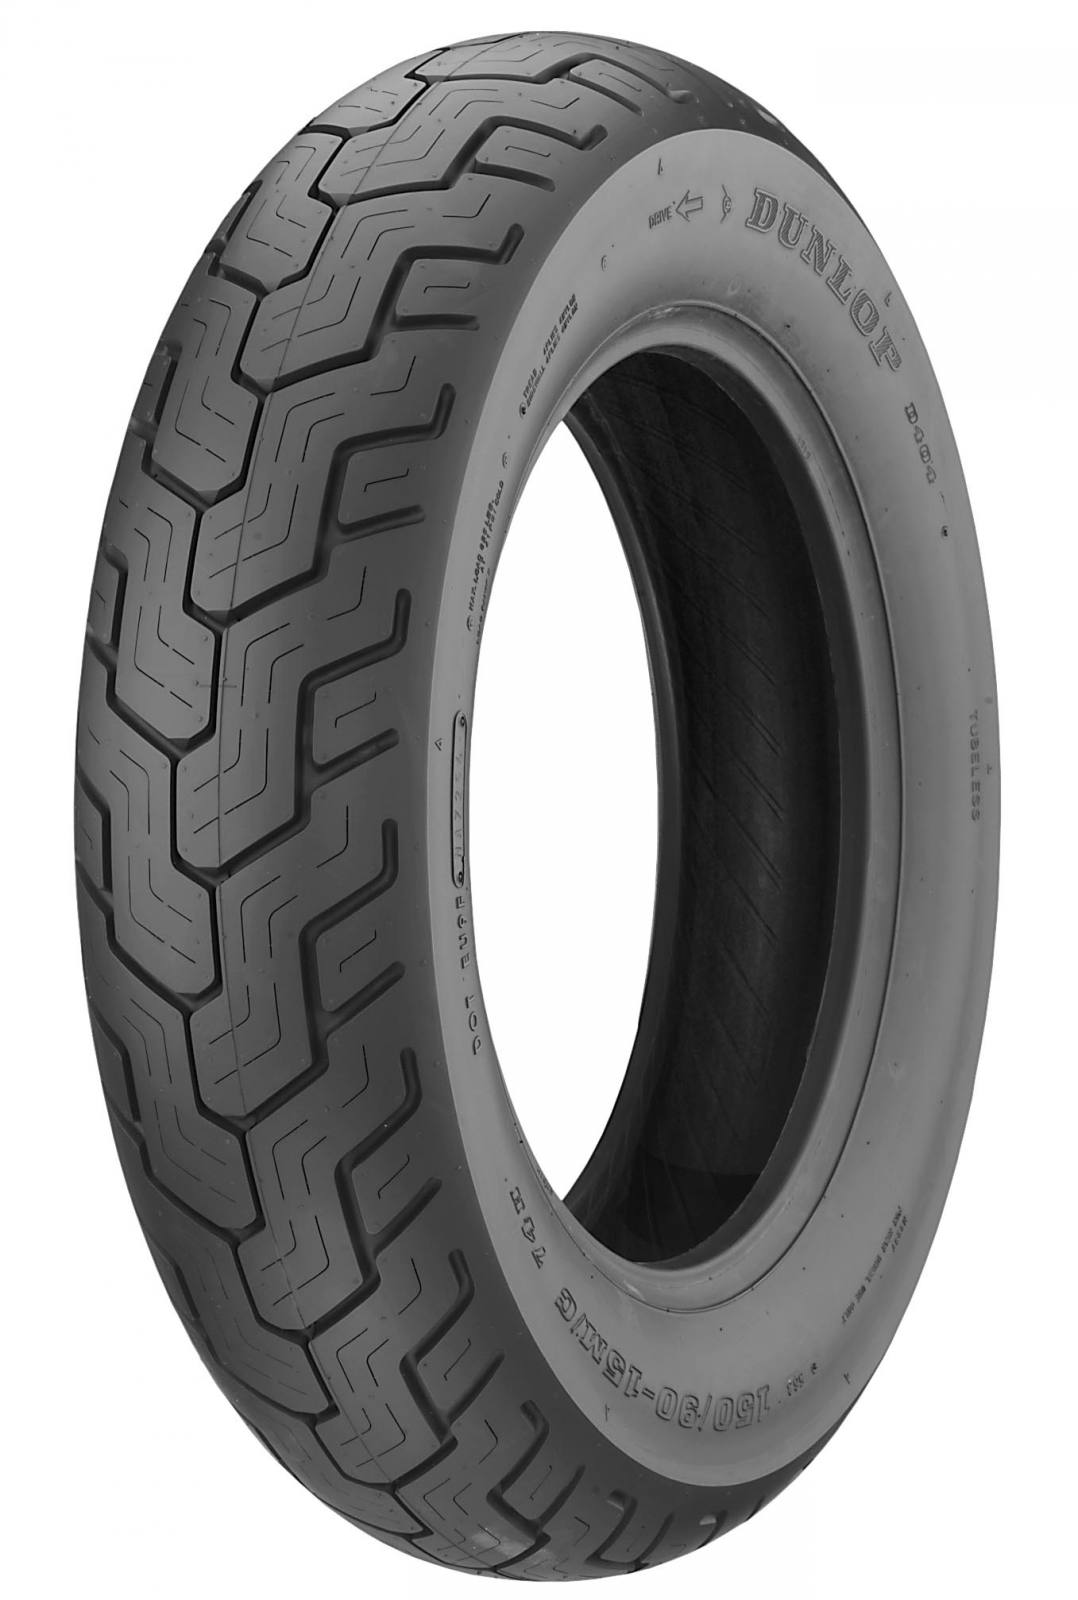 140//90-15 Bridgestone Exedra Max Rear Motorcycle Tire for Kawasaki Vulcan EN500 1990-1996 70H